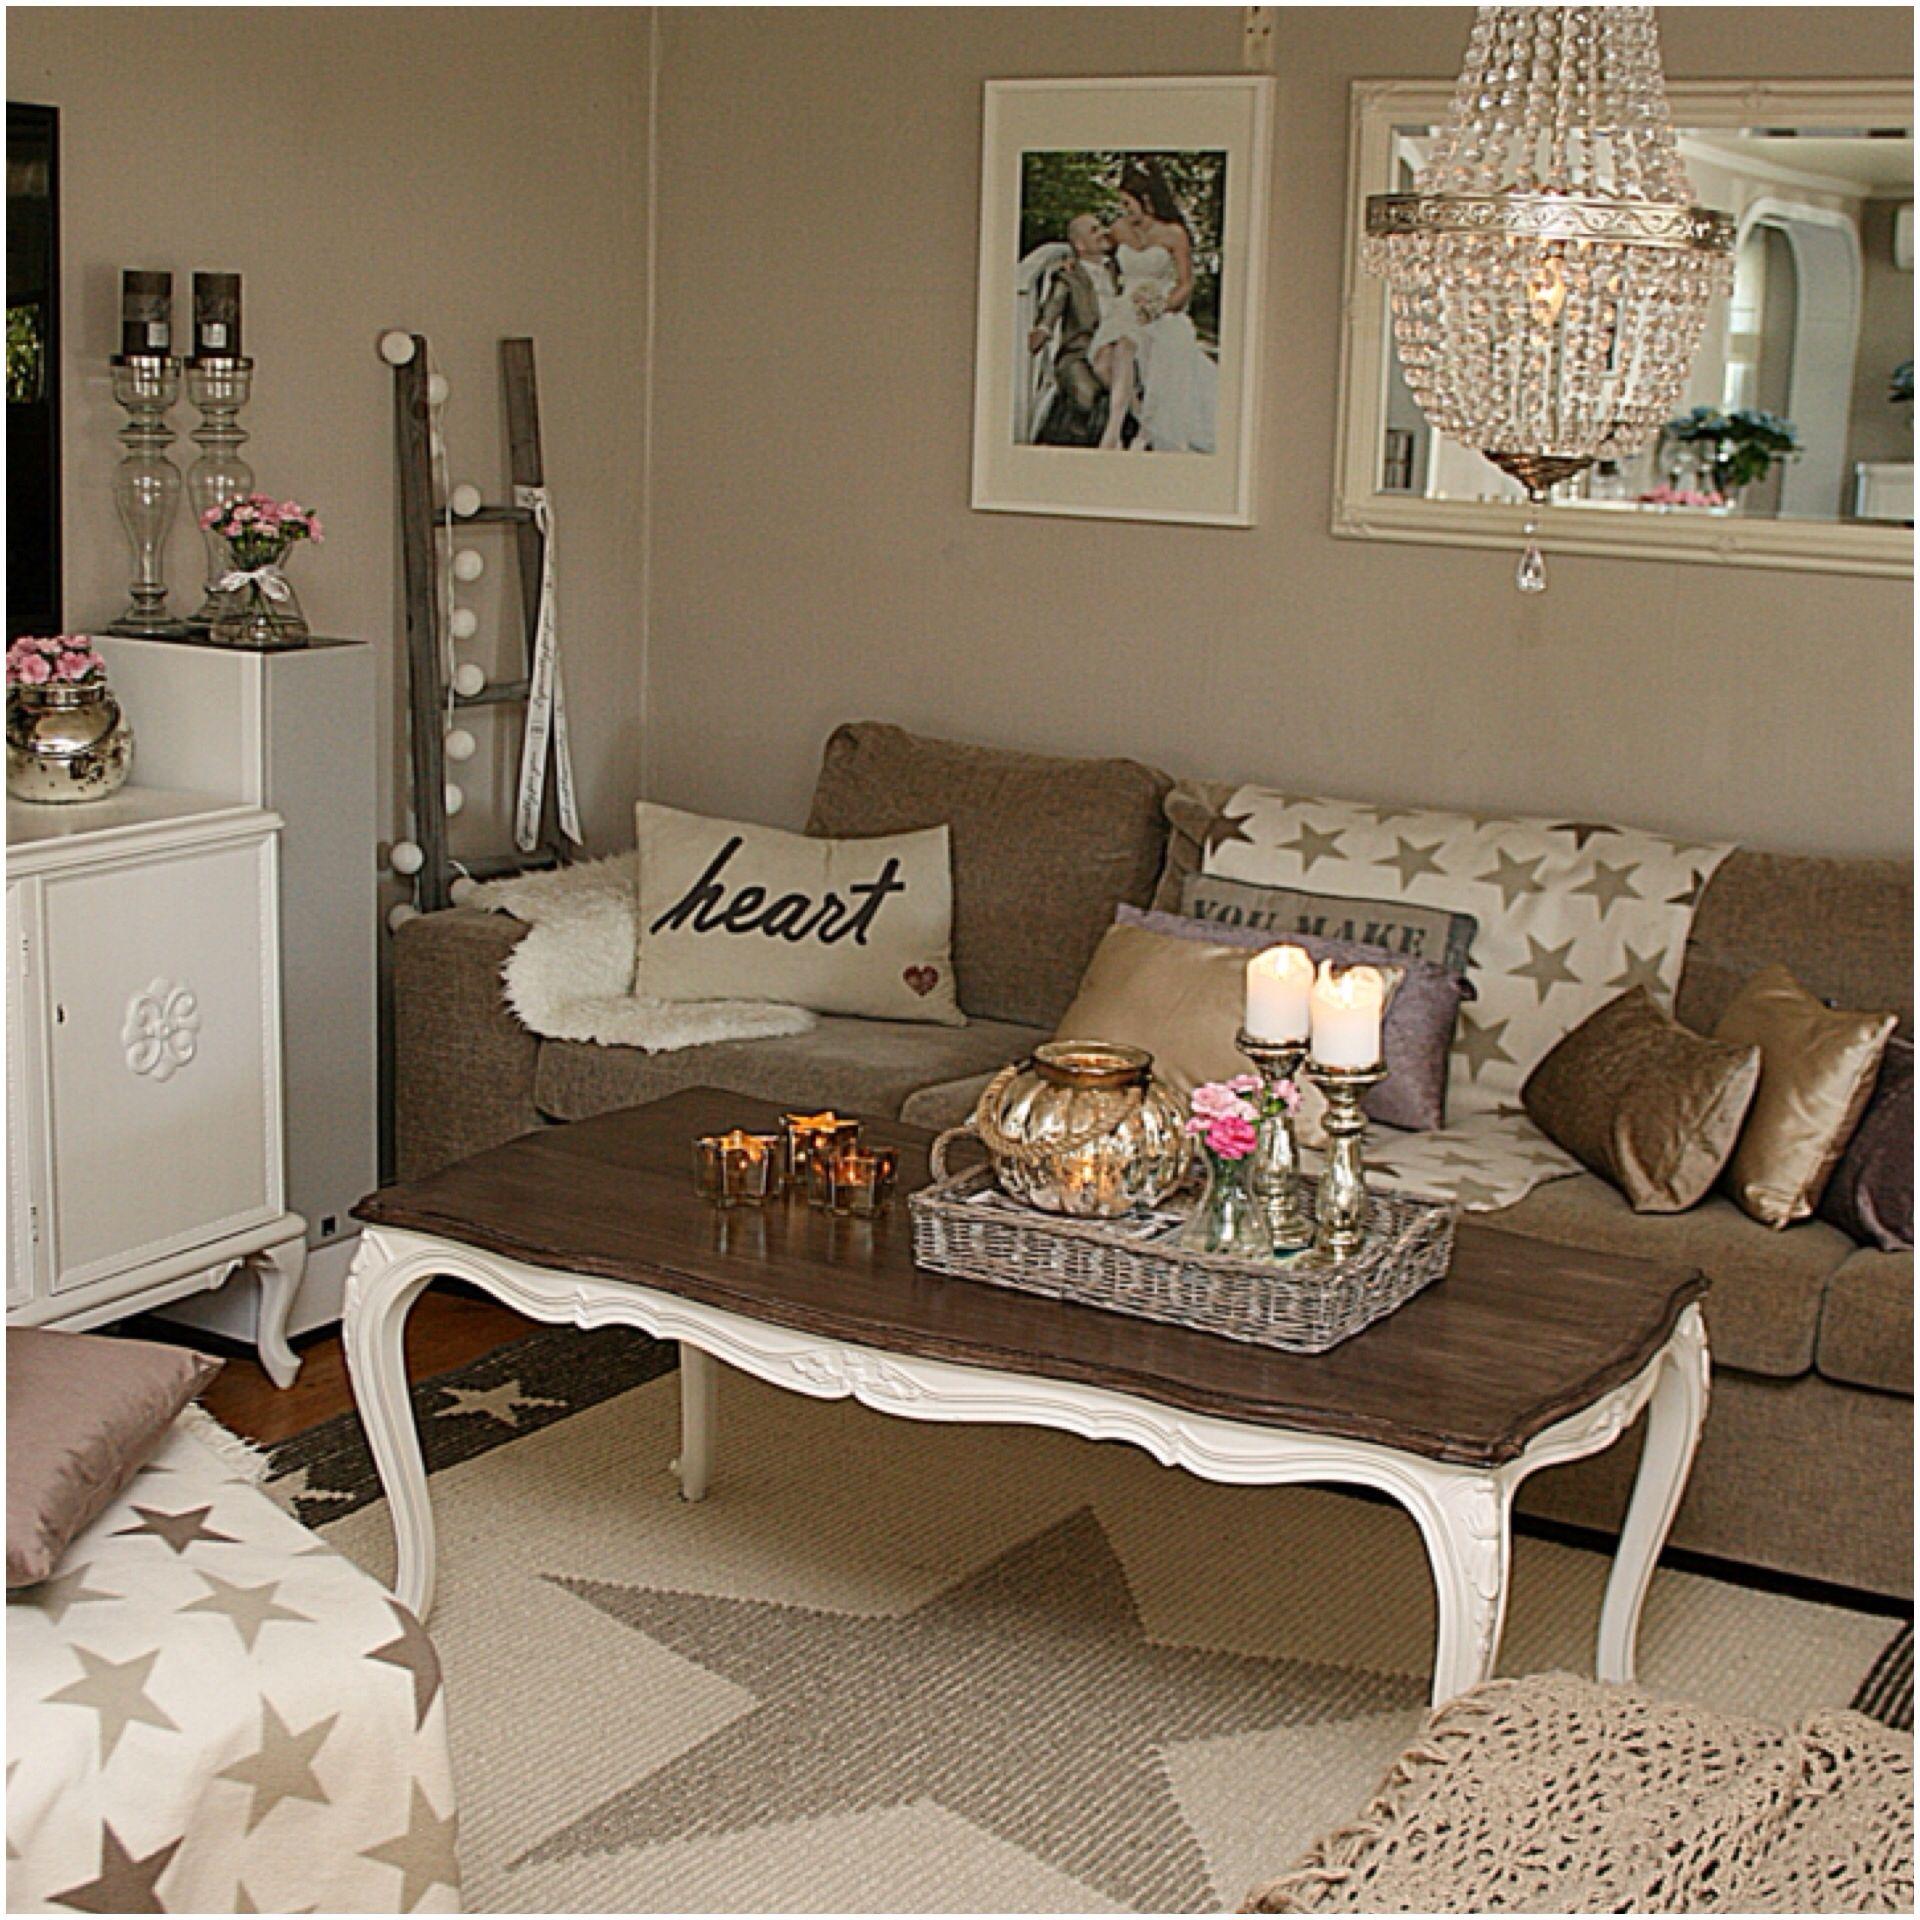 Stue, livingroom, sofa, interi?r, misslindvik, rivieramaison, stars ...